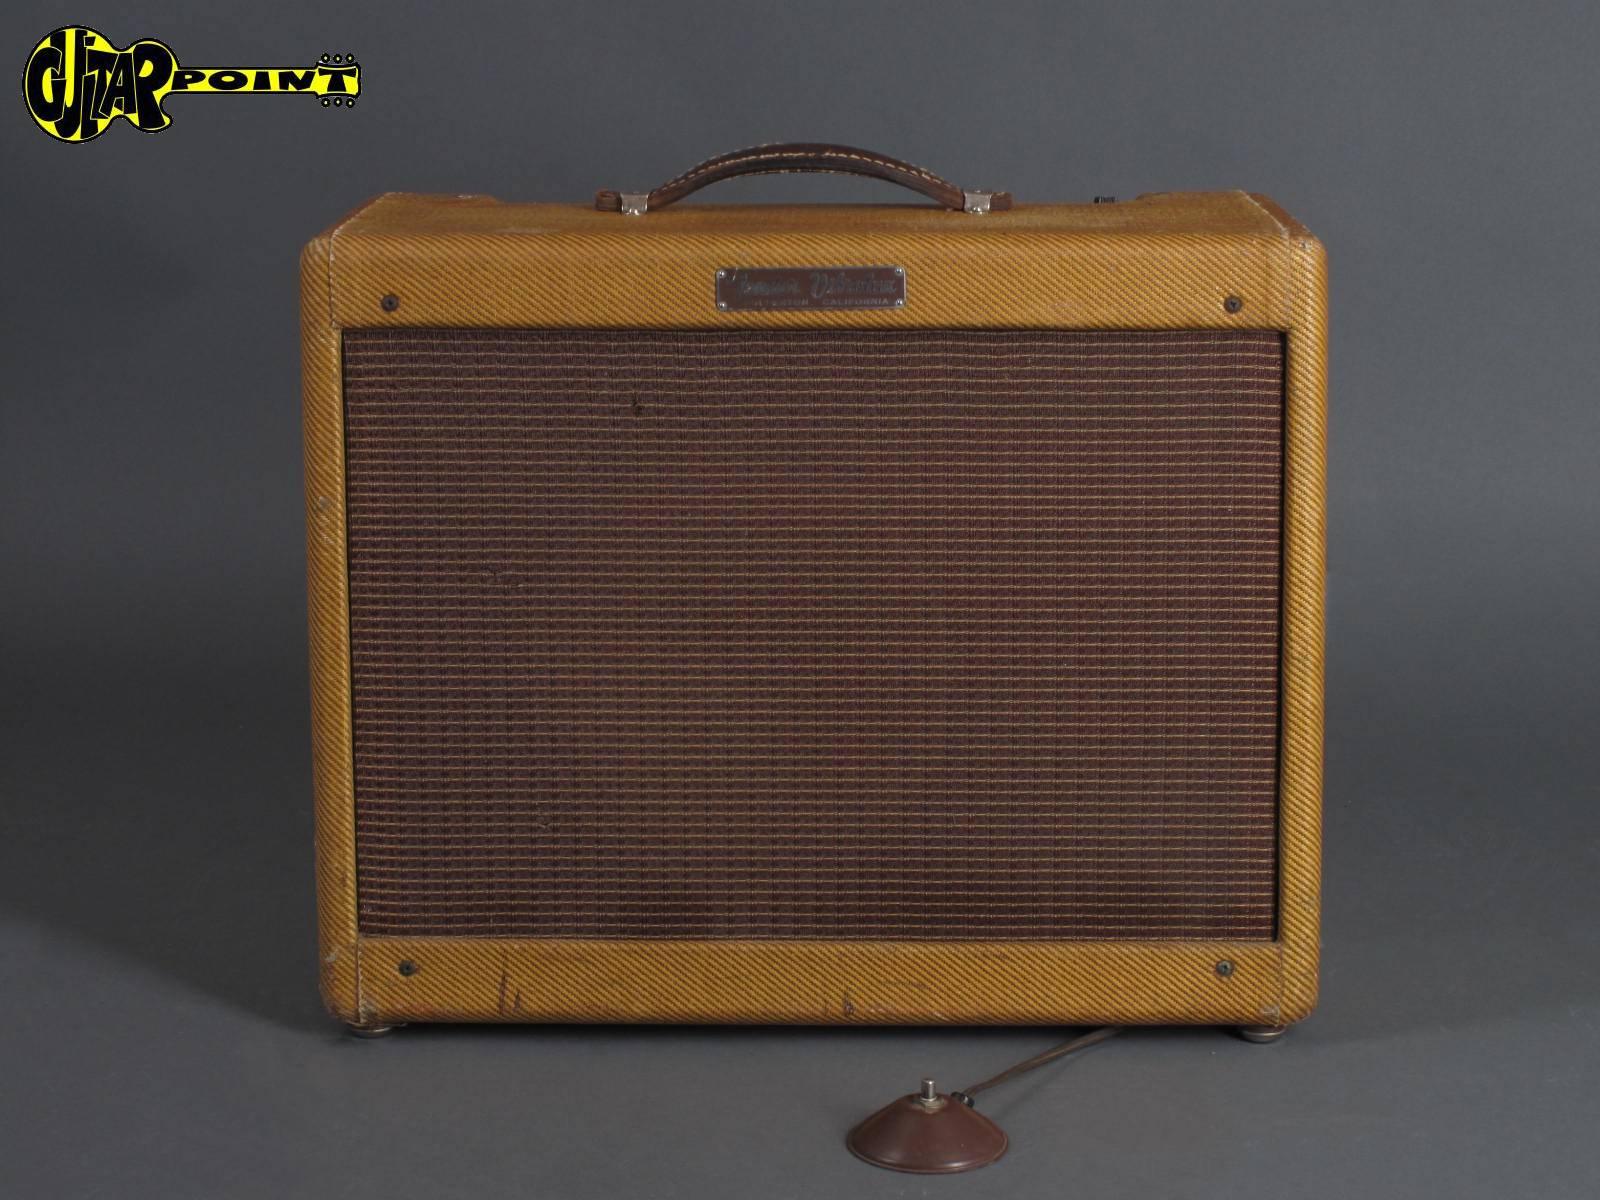 1959 Fender Vibrolux - Tweed / Wide Panel